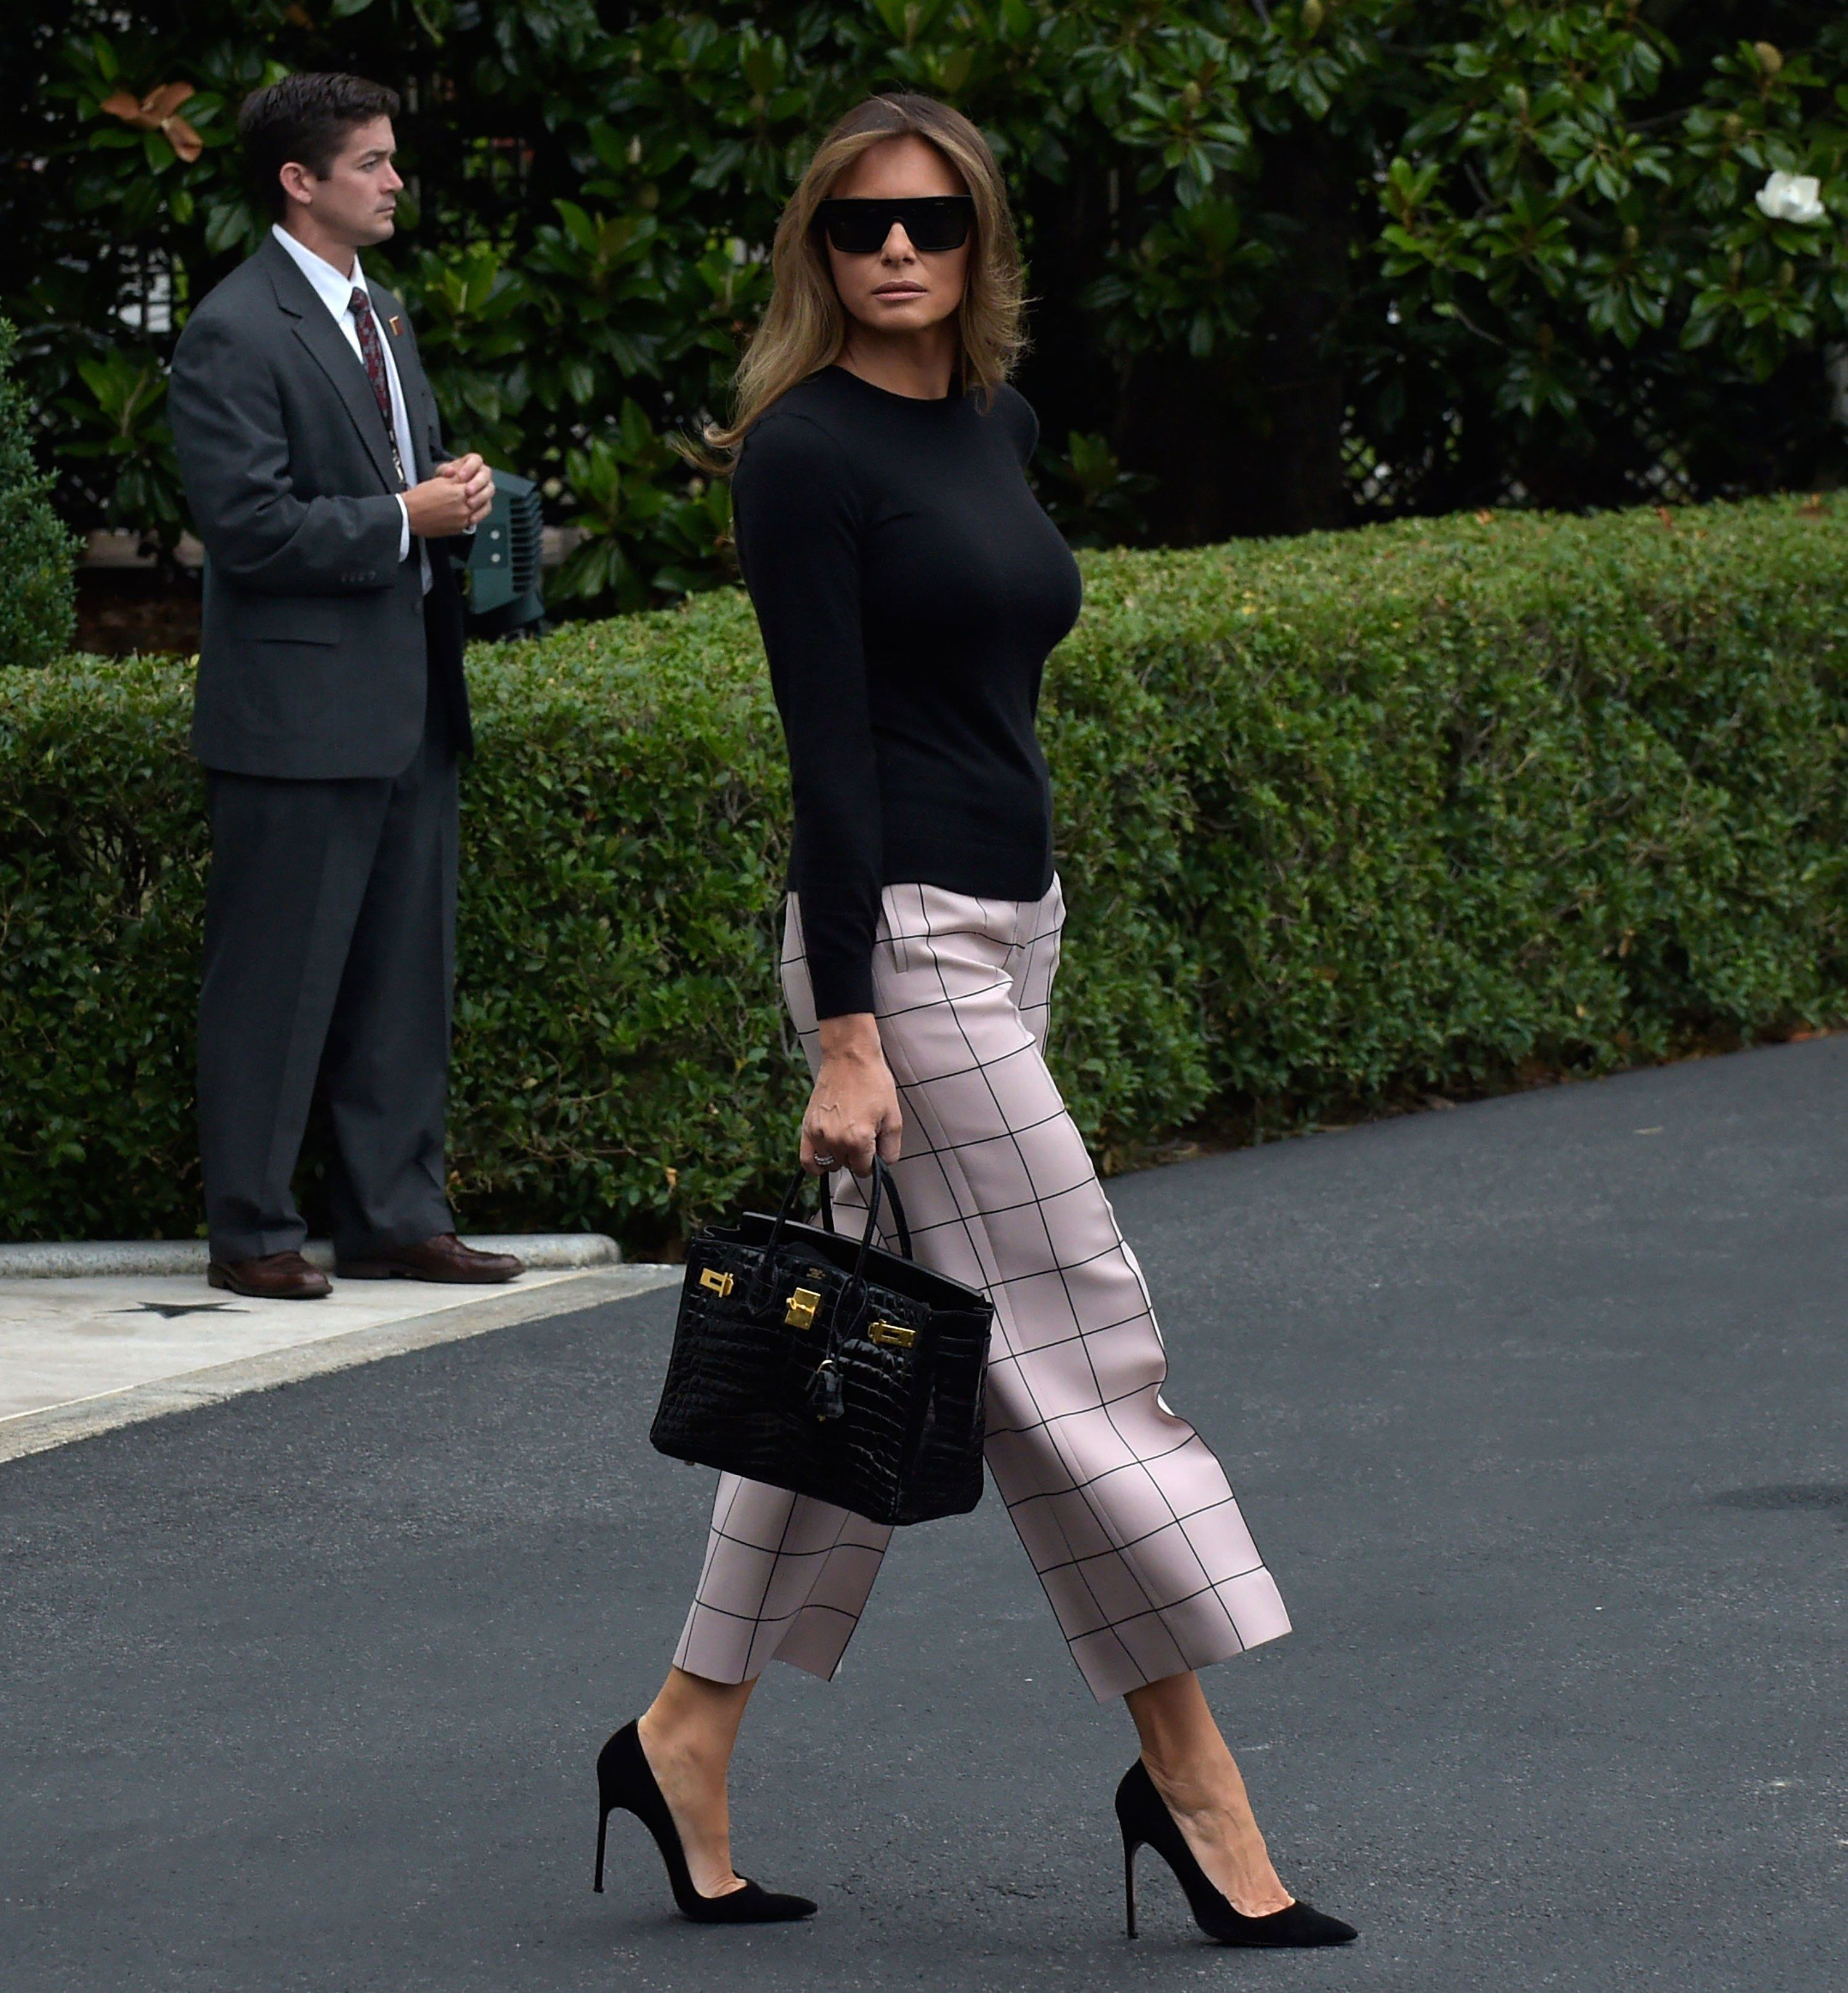 cfa86cbcb4e Melania Trump Chooses Chanel Haute Couture for Her First State Dinner   Brigitte Macron Wears Custom Louis Vuitton